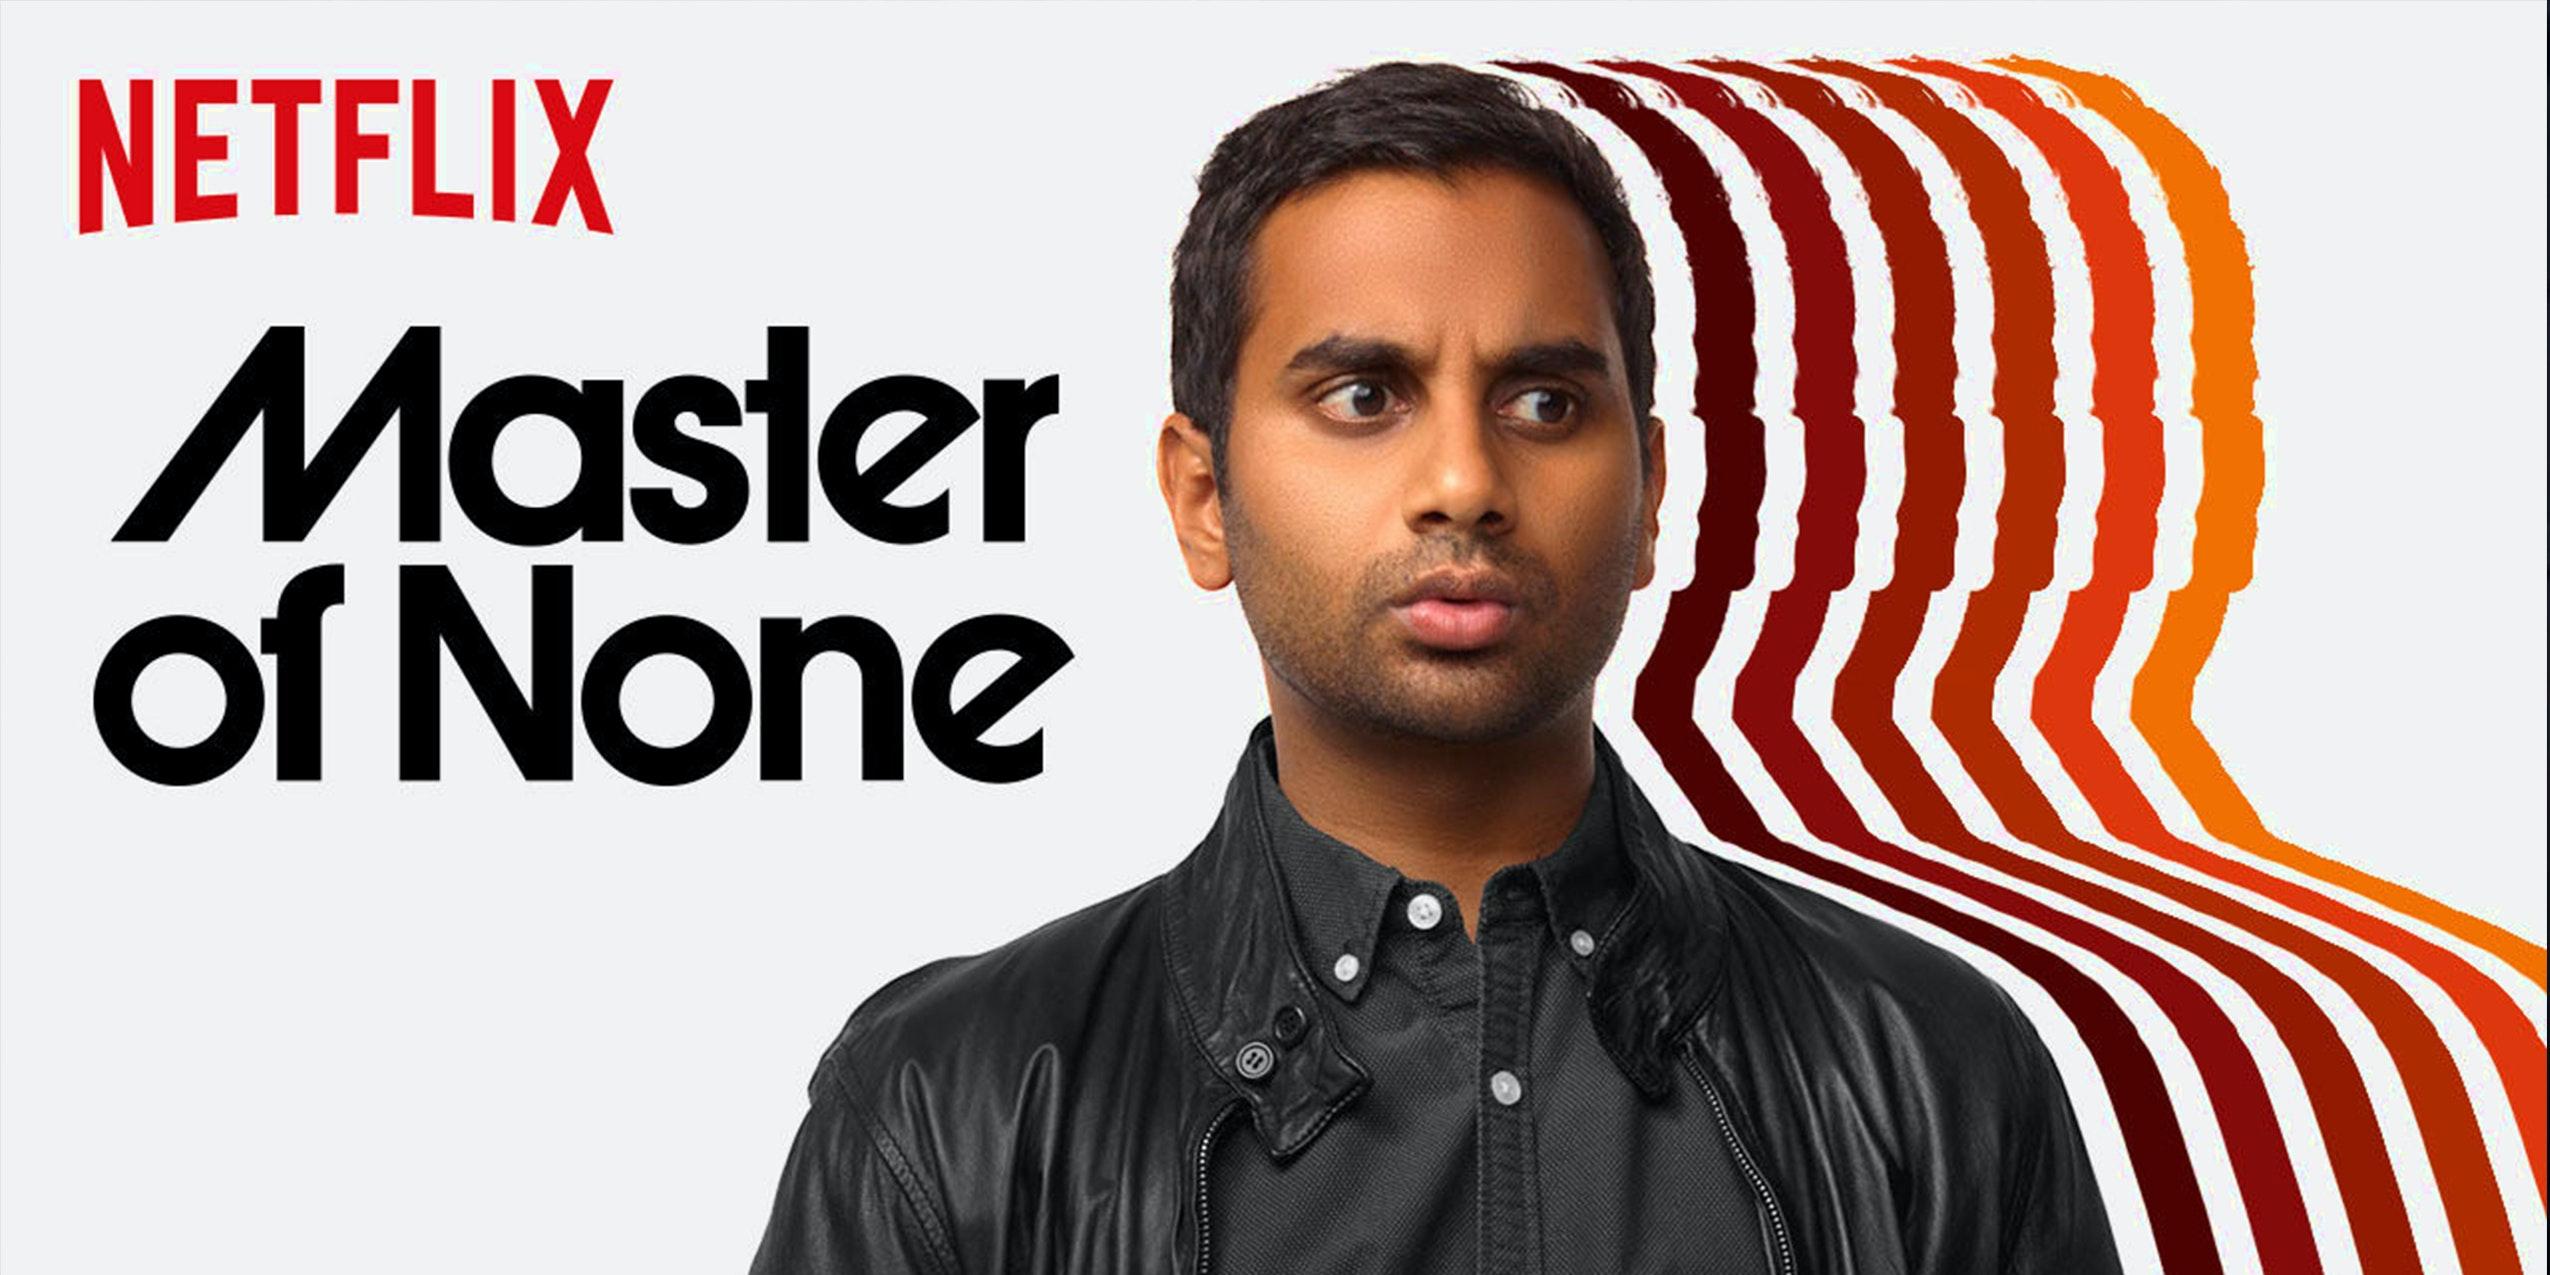 master of none Netflix original series